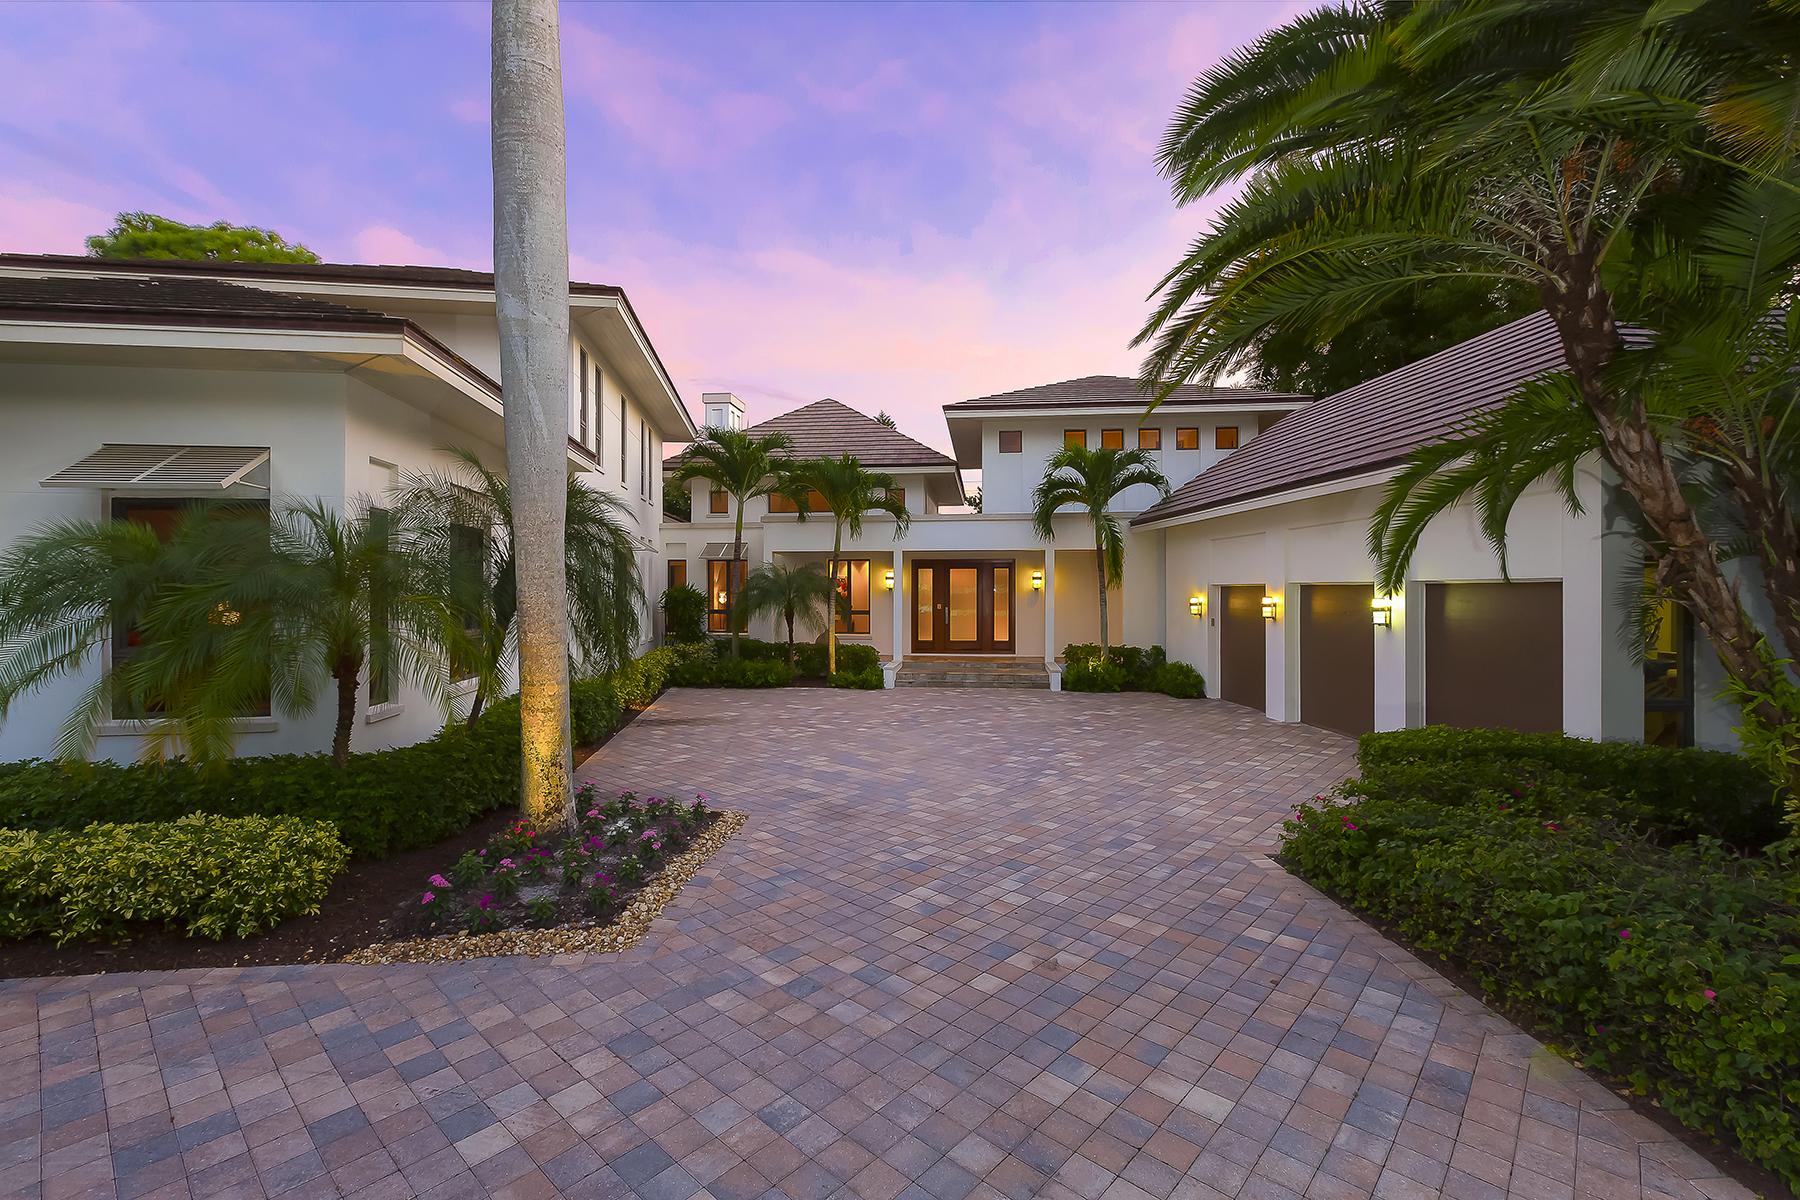 Villa per Vendita alle ore COQUINA SANDS 396 Yucca Rd Coquina Sands, Naples, Florida, 34102 Stati Uniti